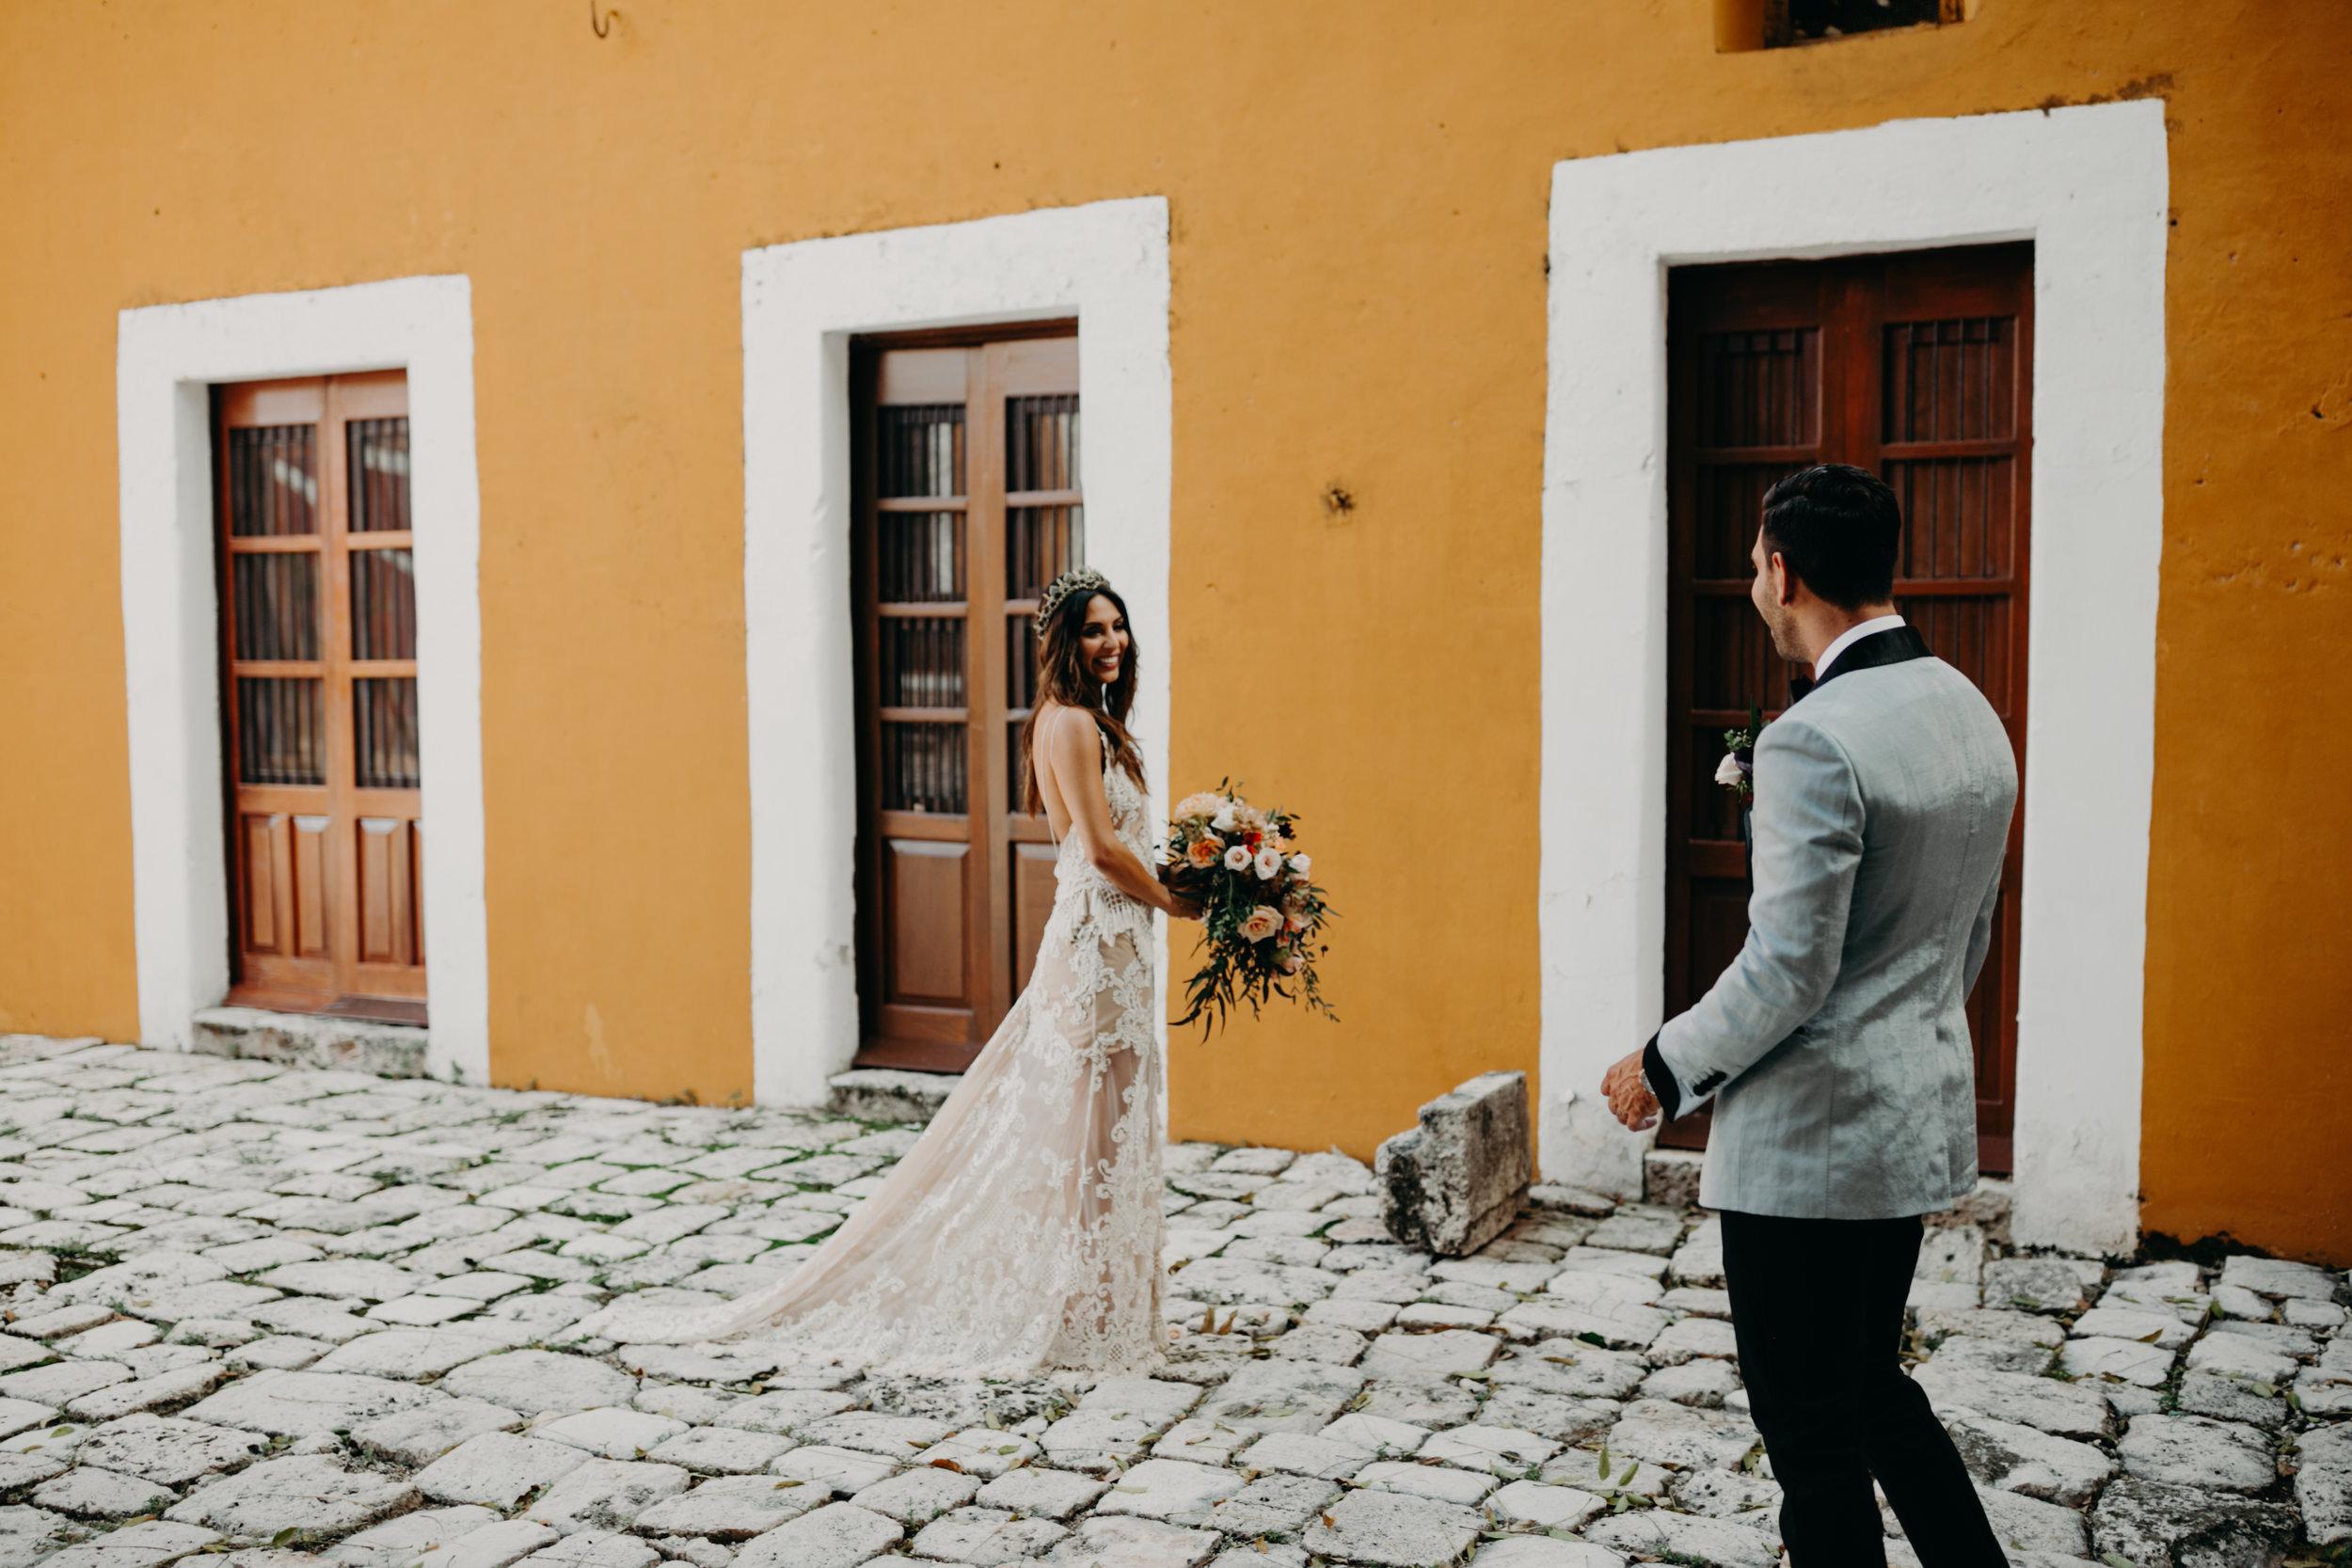 Hacienda Temozon Yucatan Mexico Wedding | Ida & Peter Emily Magers Photography-558.jpg